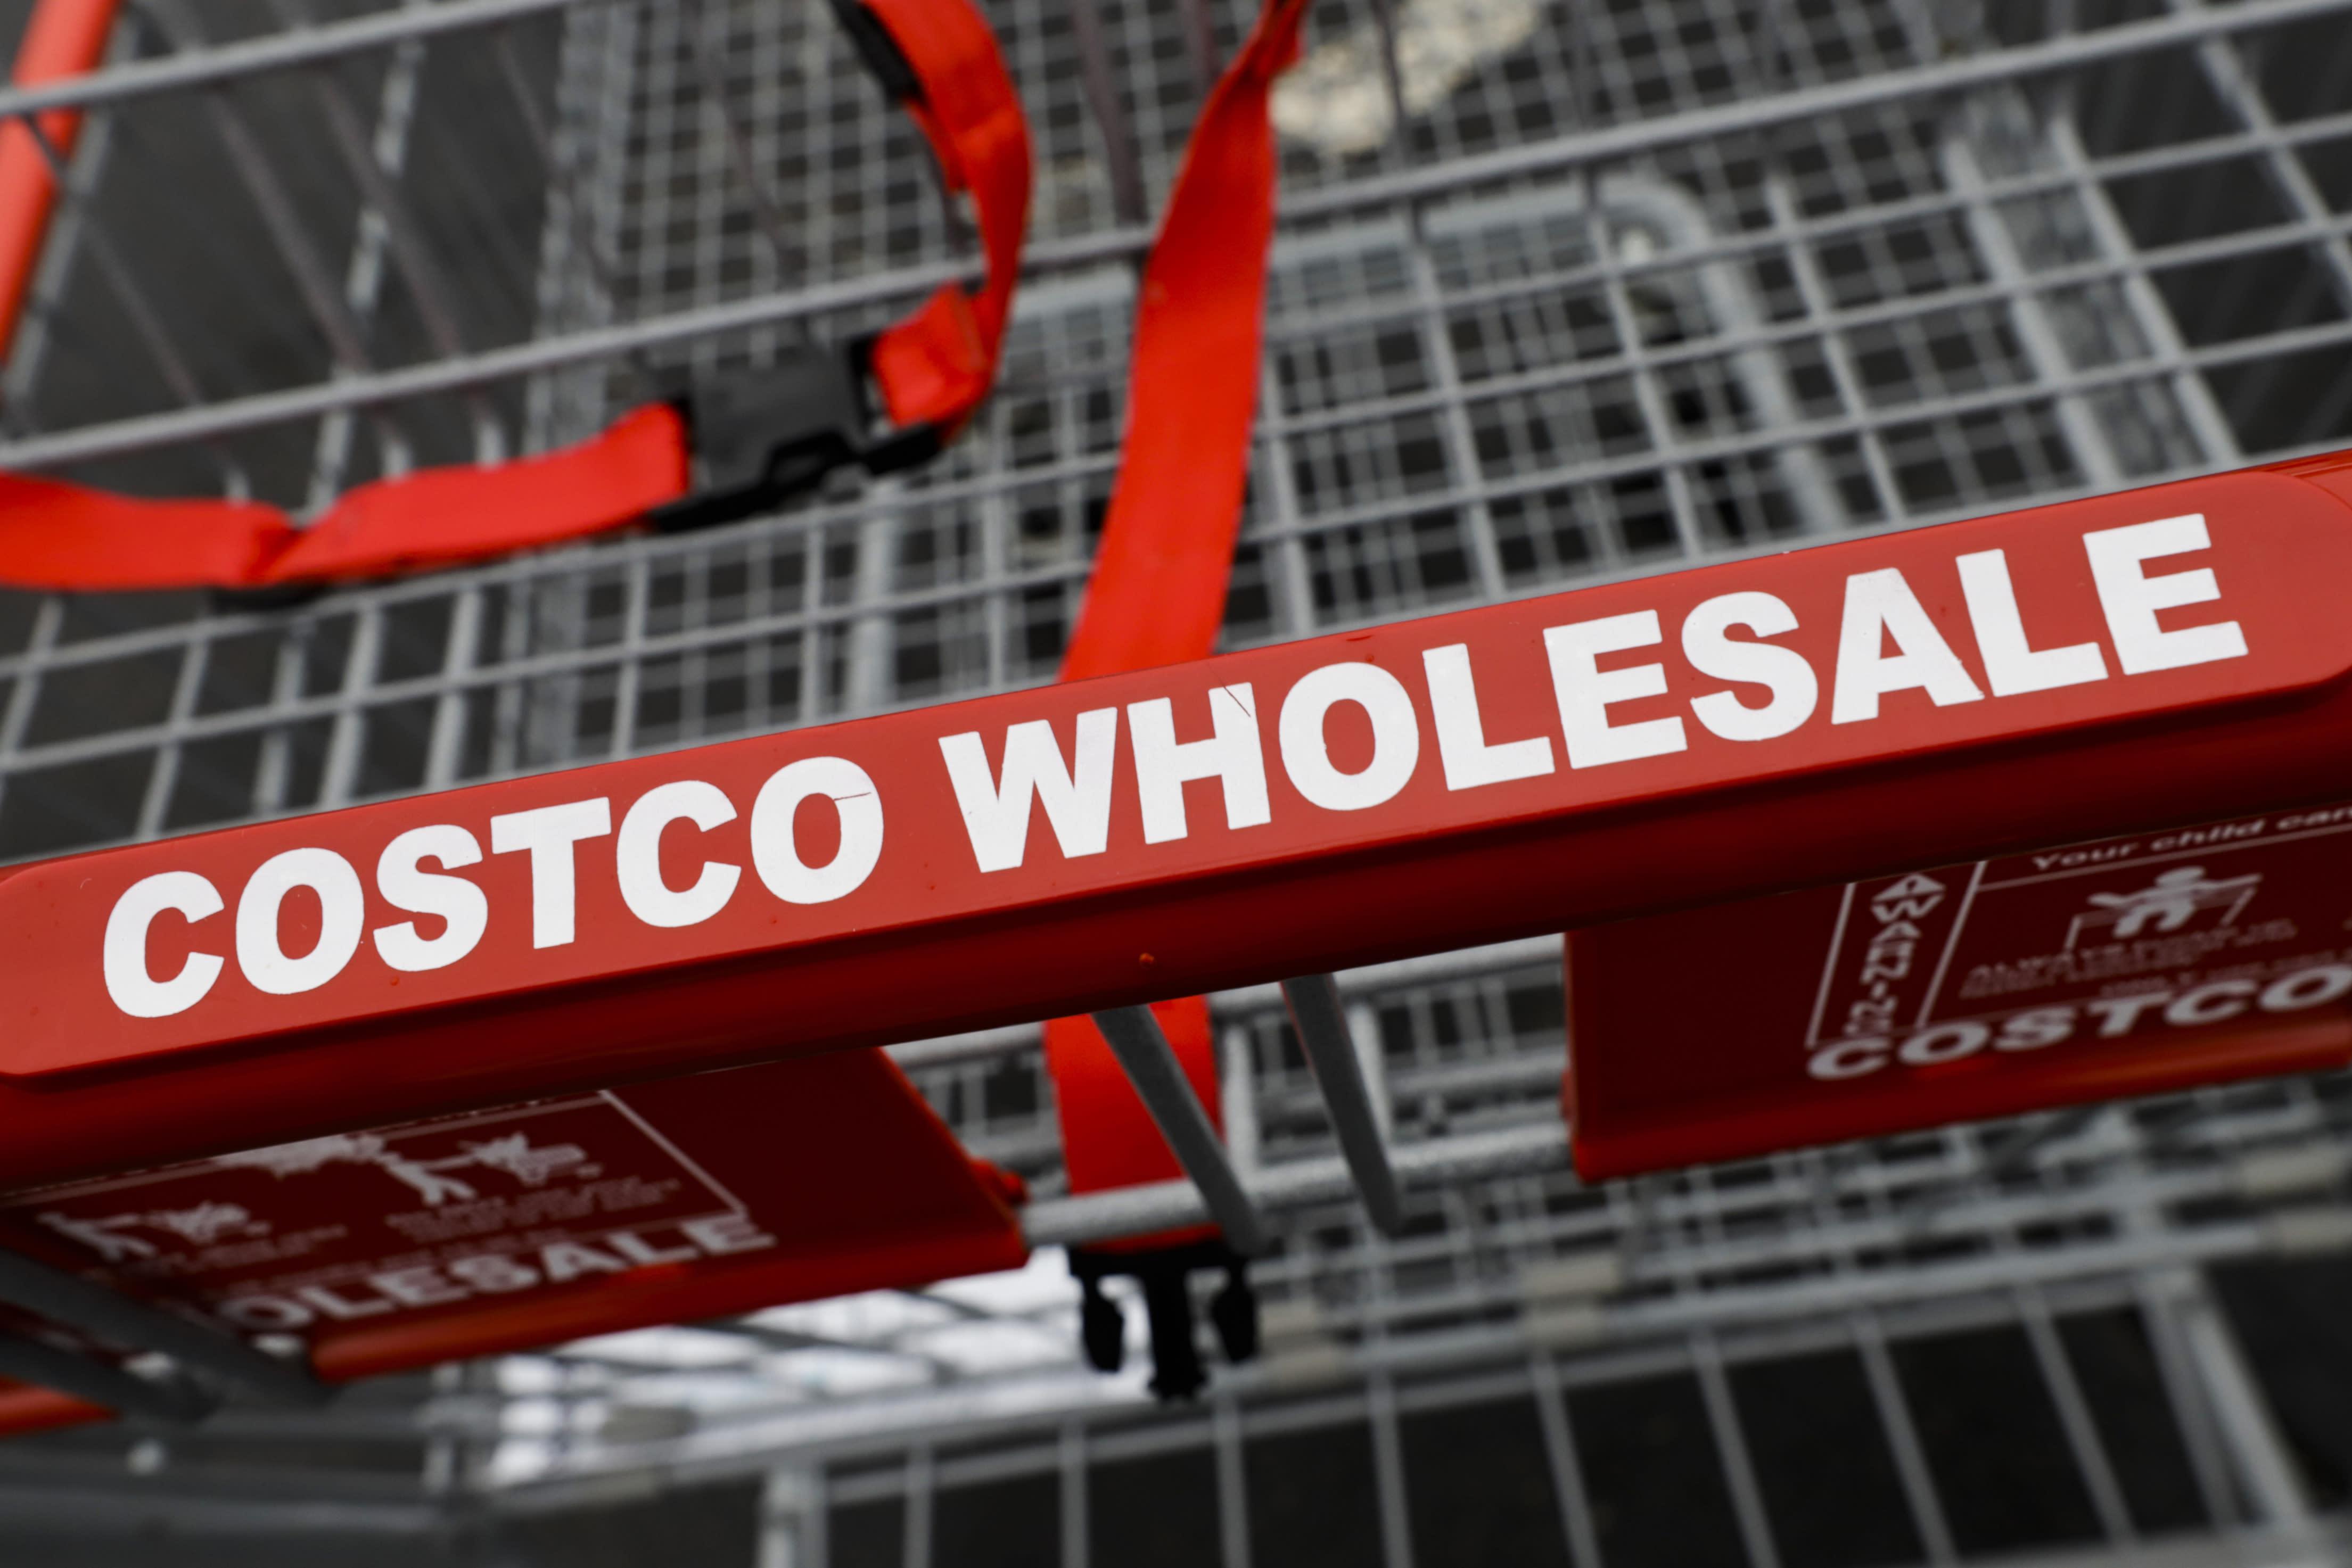 Costco's weak quarter, HP slashing jobs, BP getting new CEO